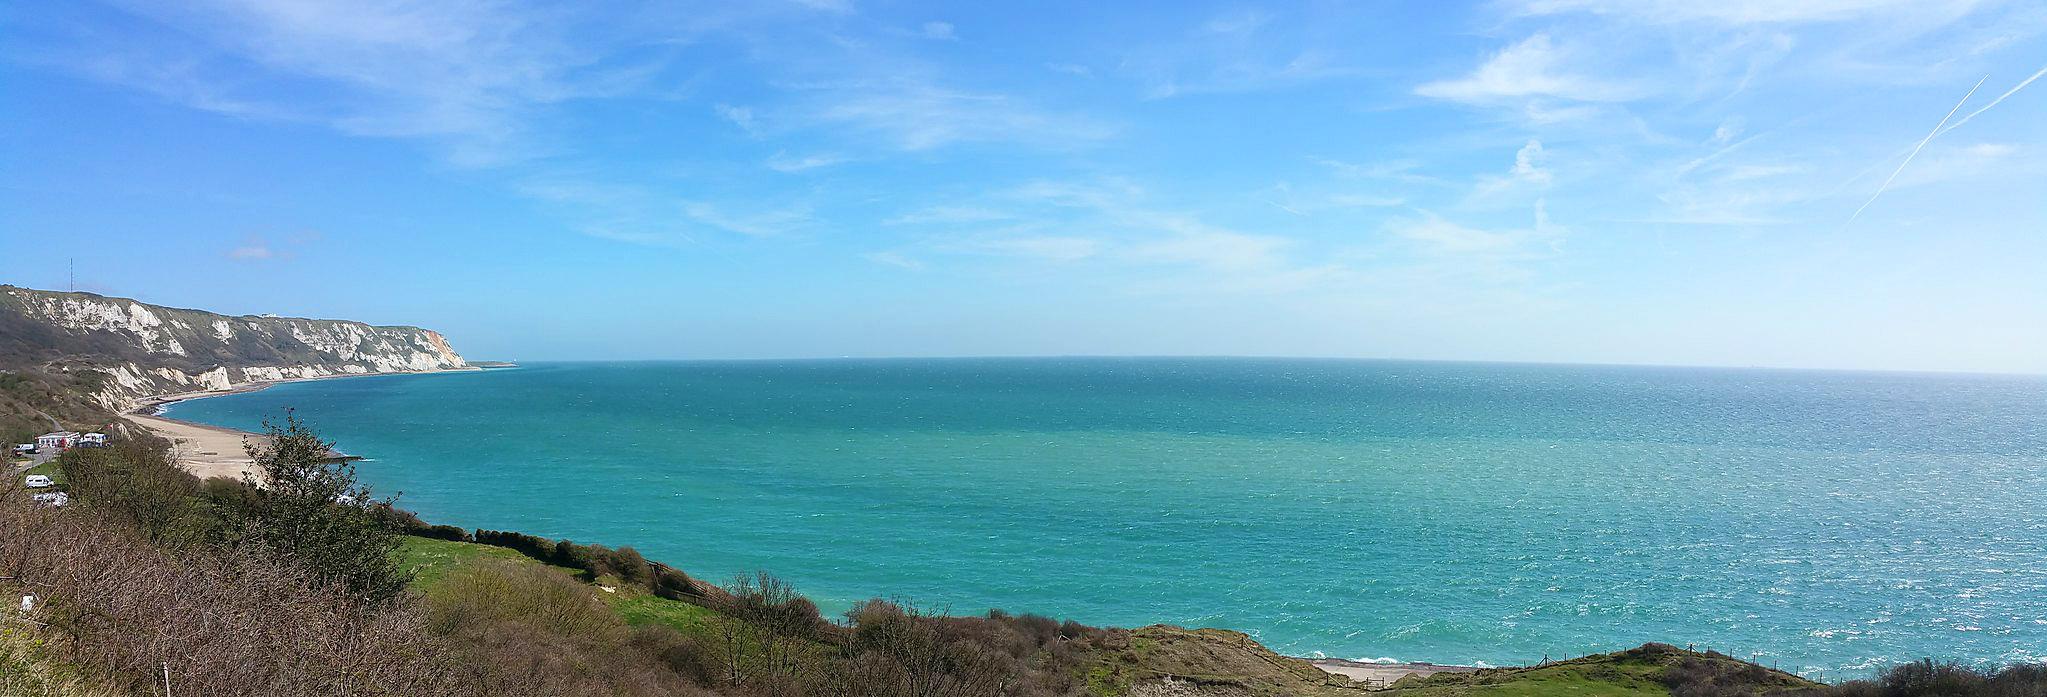 Folkestone seascape by Andy M.jpg